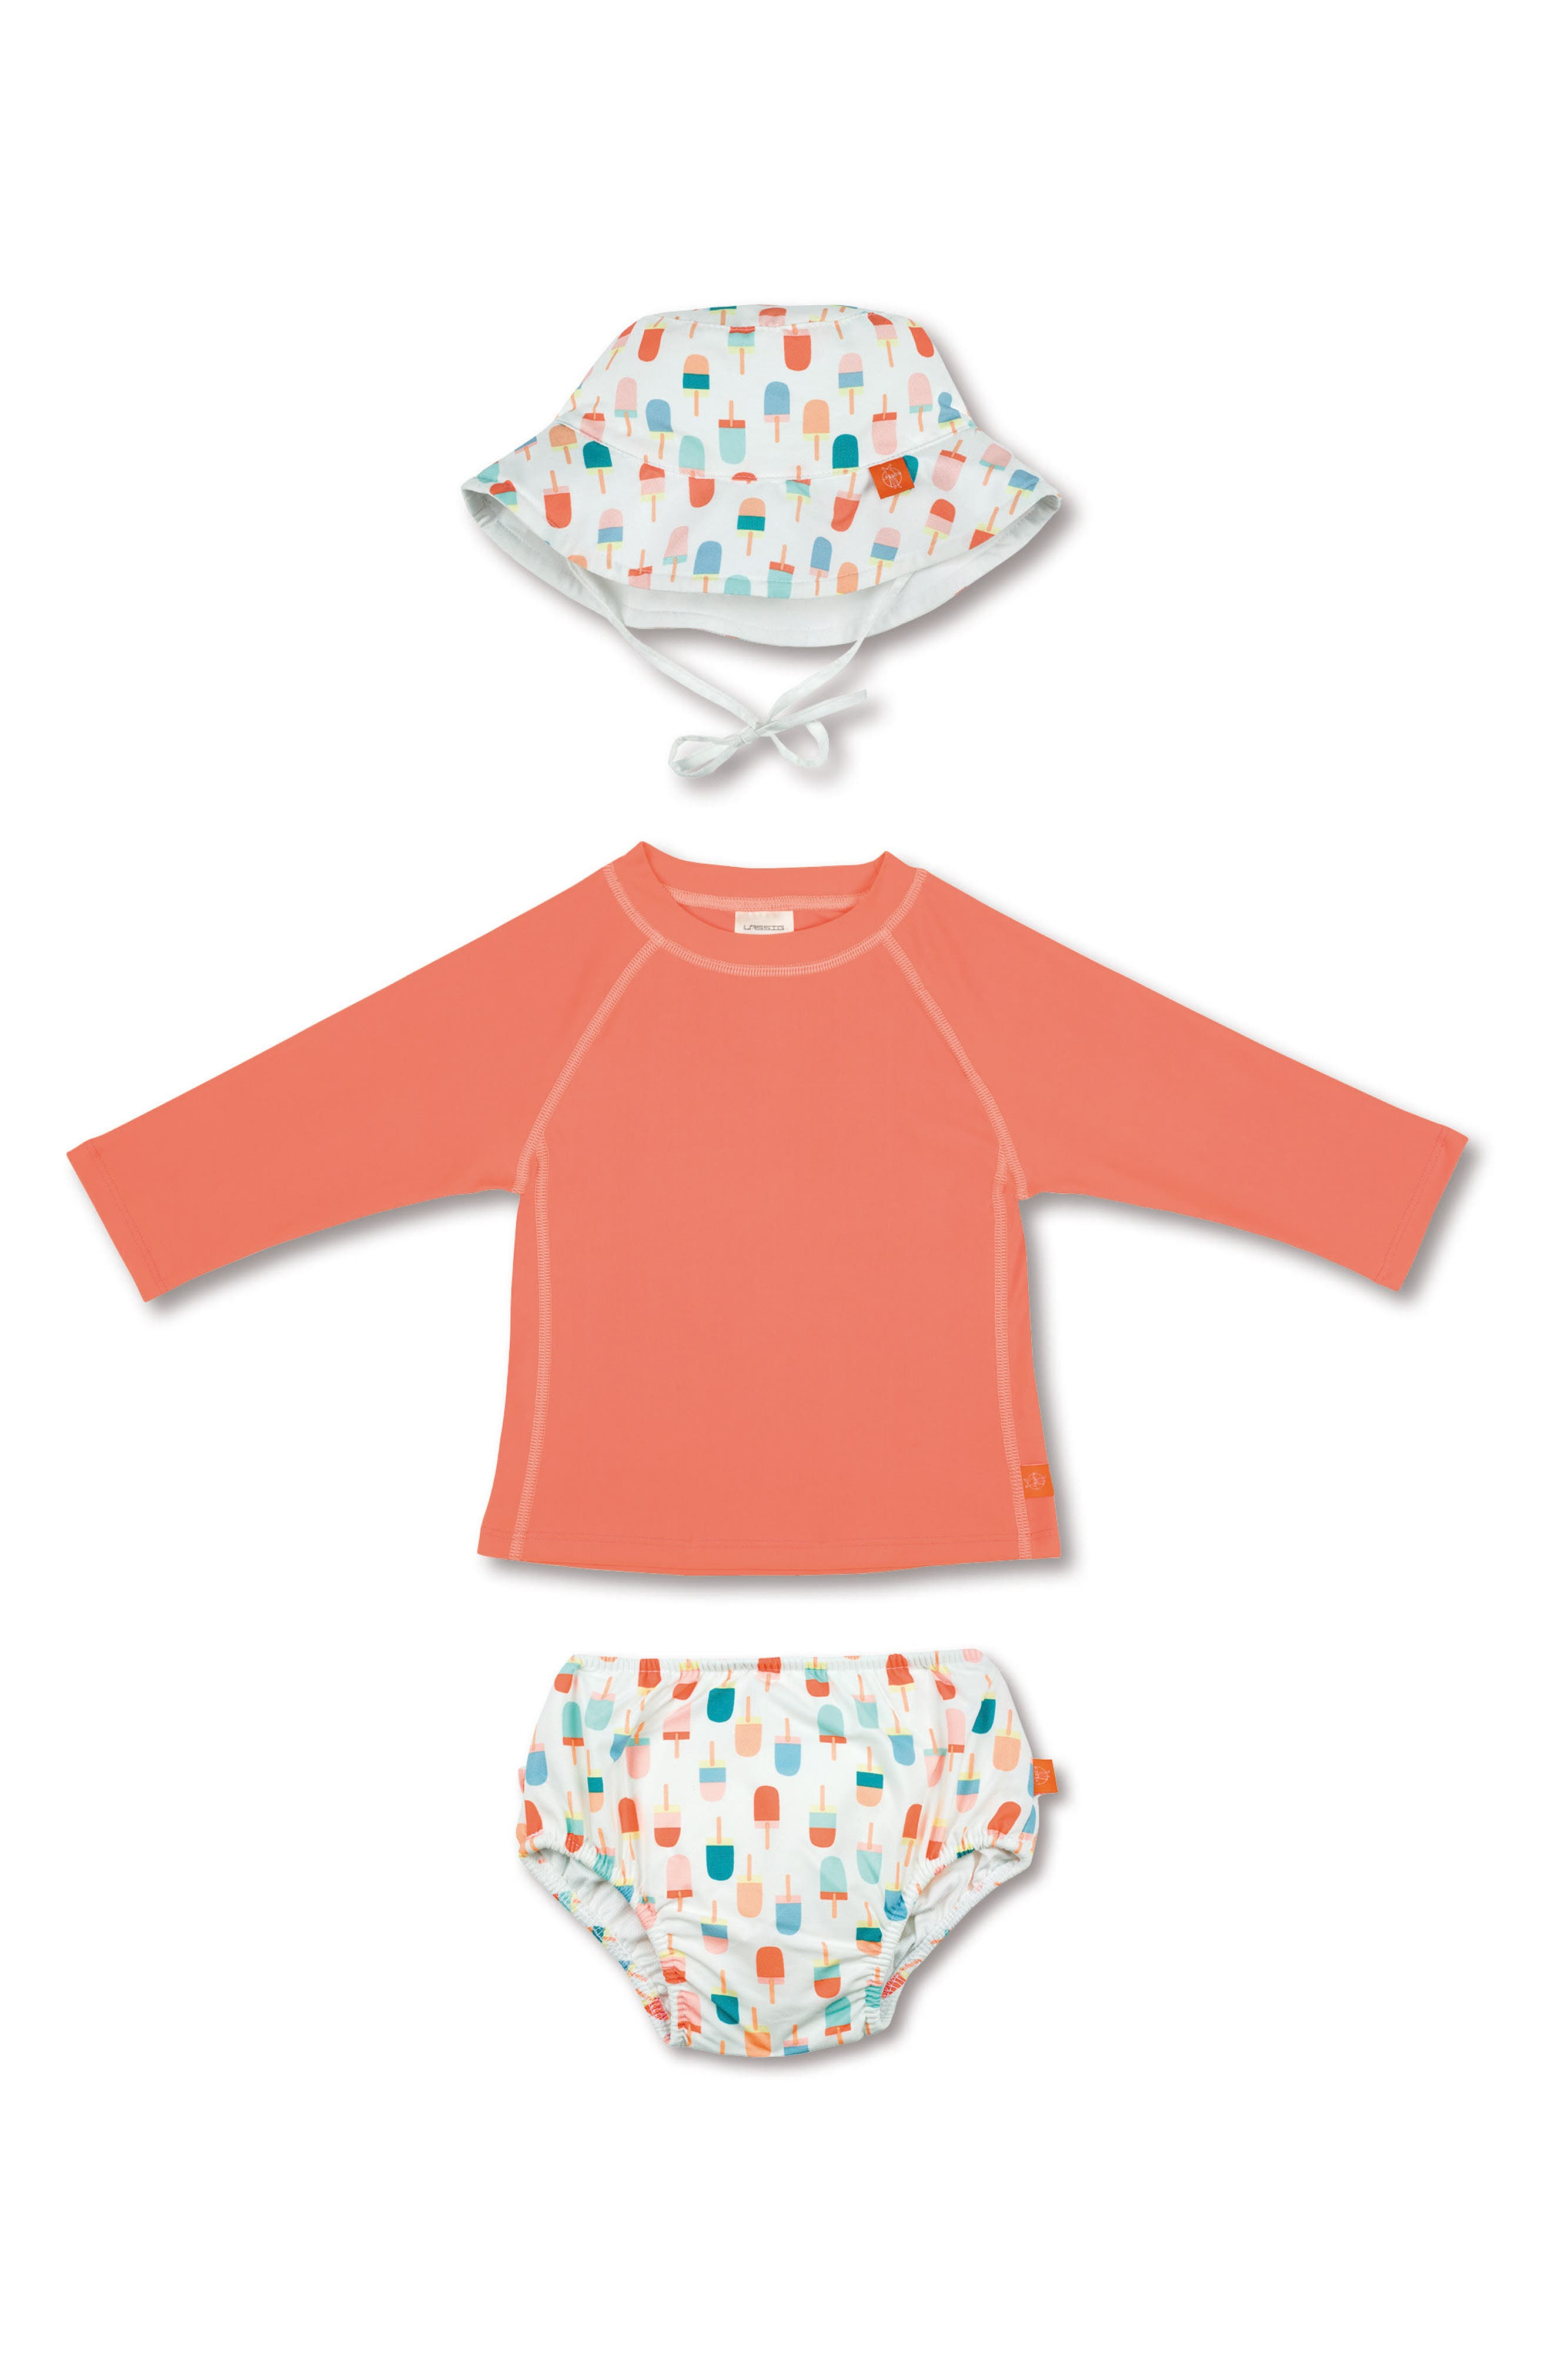 LÄSSIG Lassig Two-Piece Rashguard Swimsuit & Hat Set